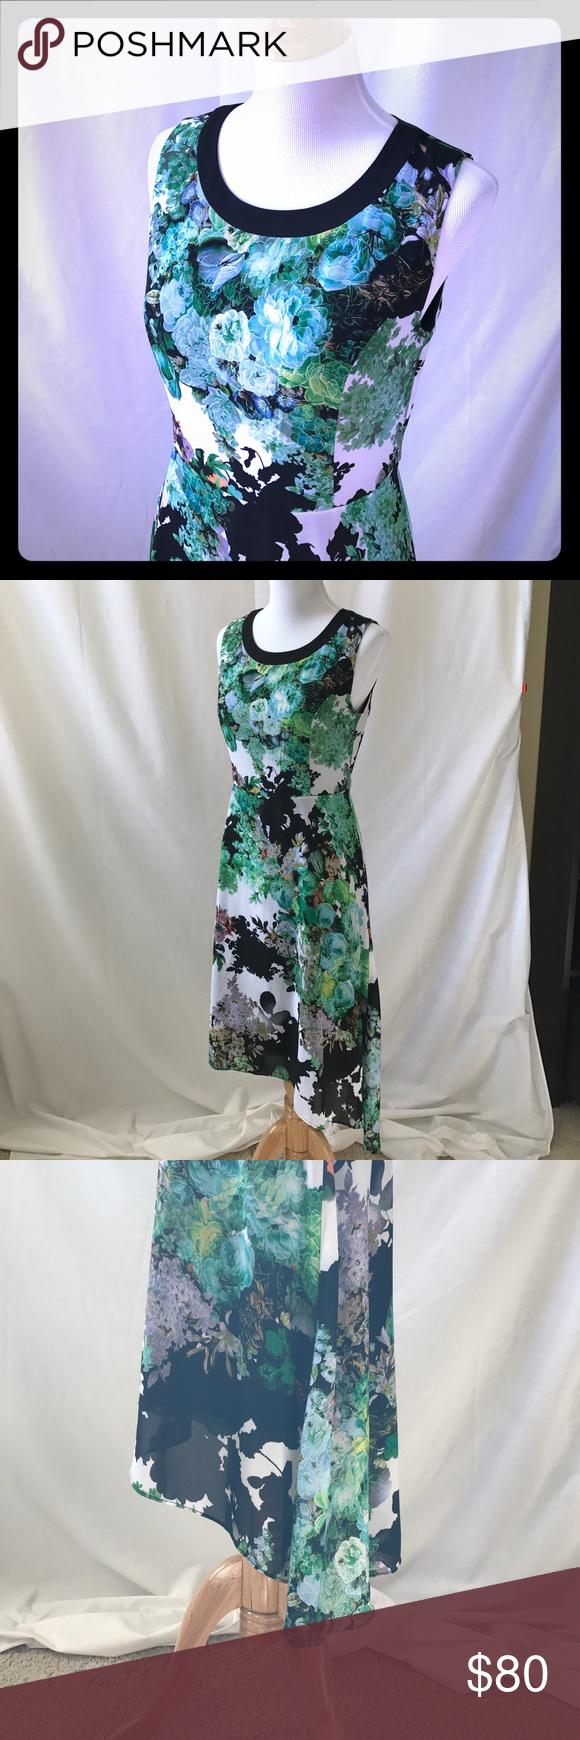 Patrizia Luca Garden Party Floral Dress   Dress brands, Hemline and ...